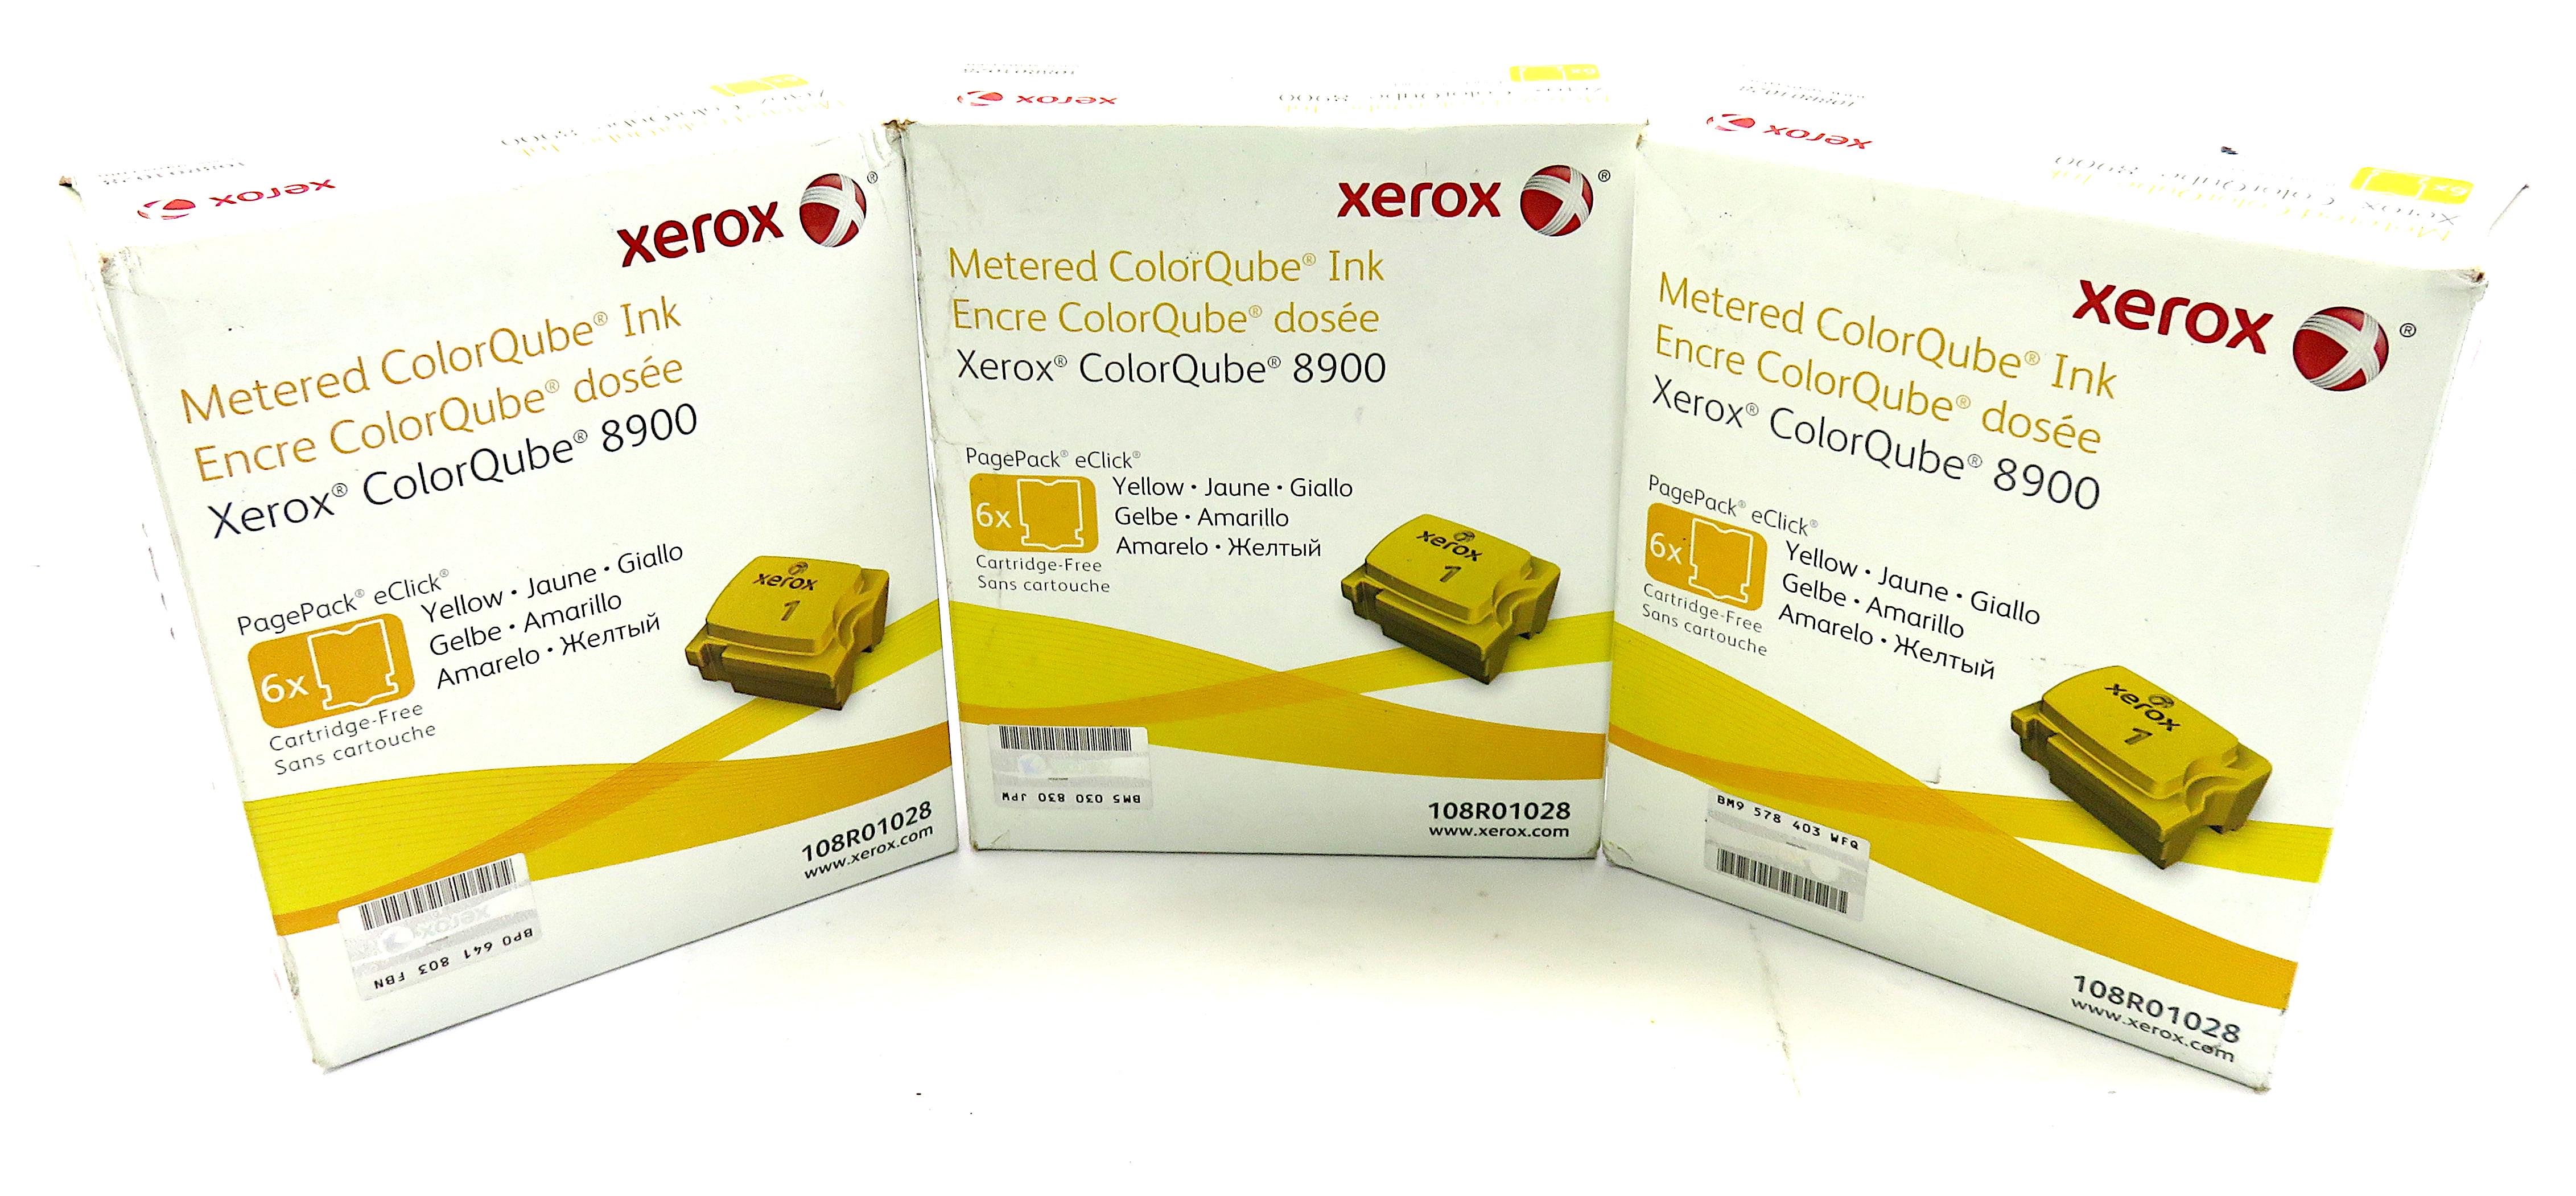 Xerox Colorqube 8900 Printer Ink - 3 Pack: Yellow - 108R01028